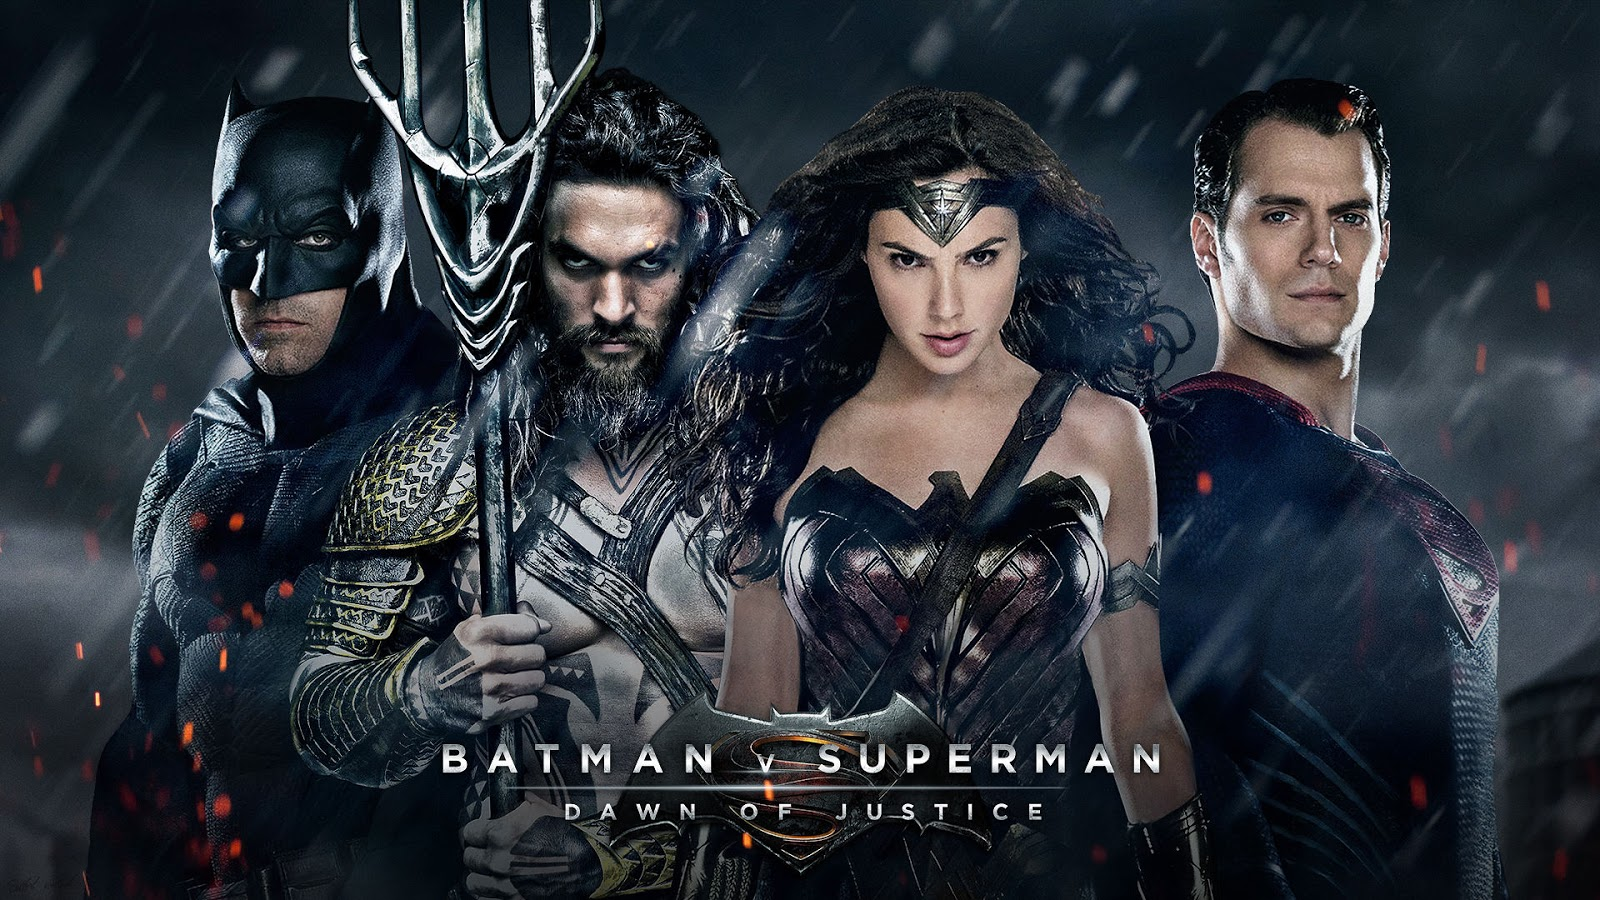 batman v superman dawn of justice soundtrack download free